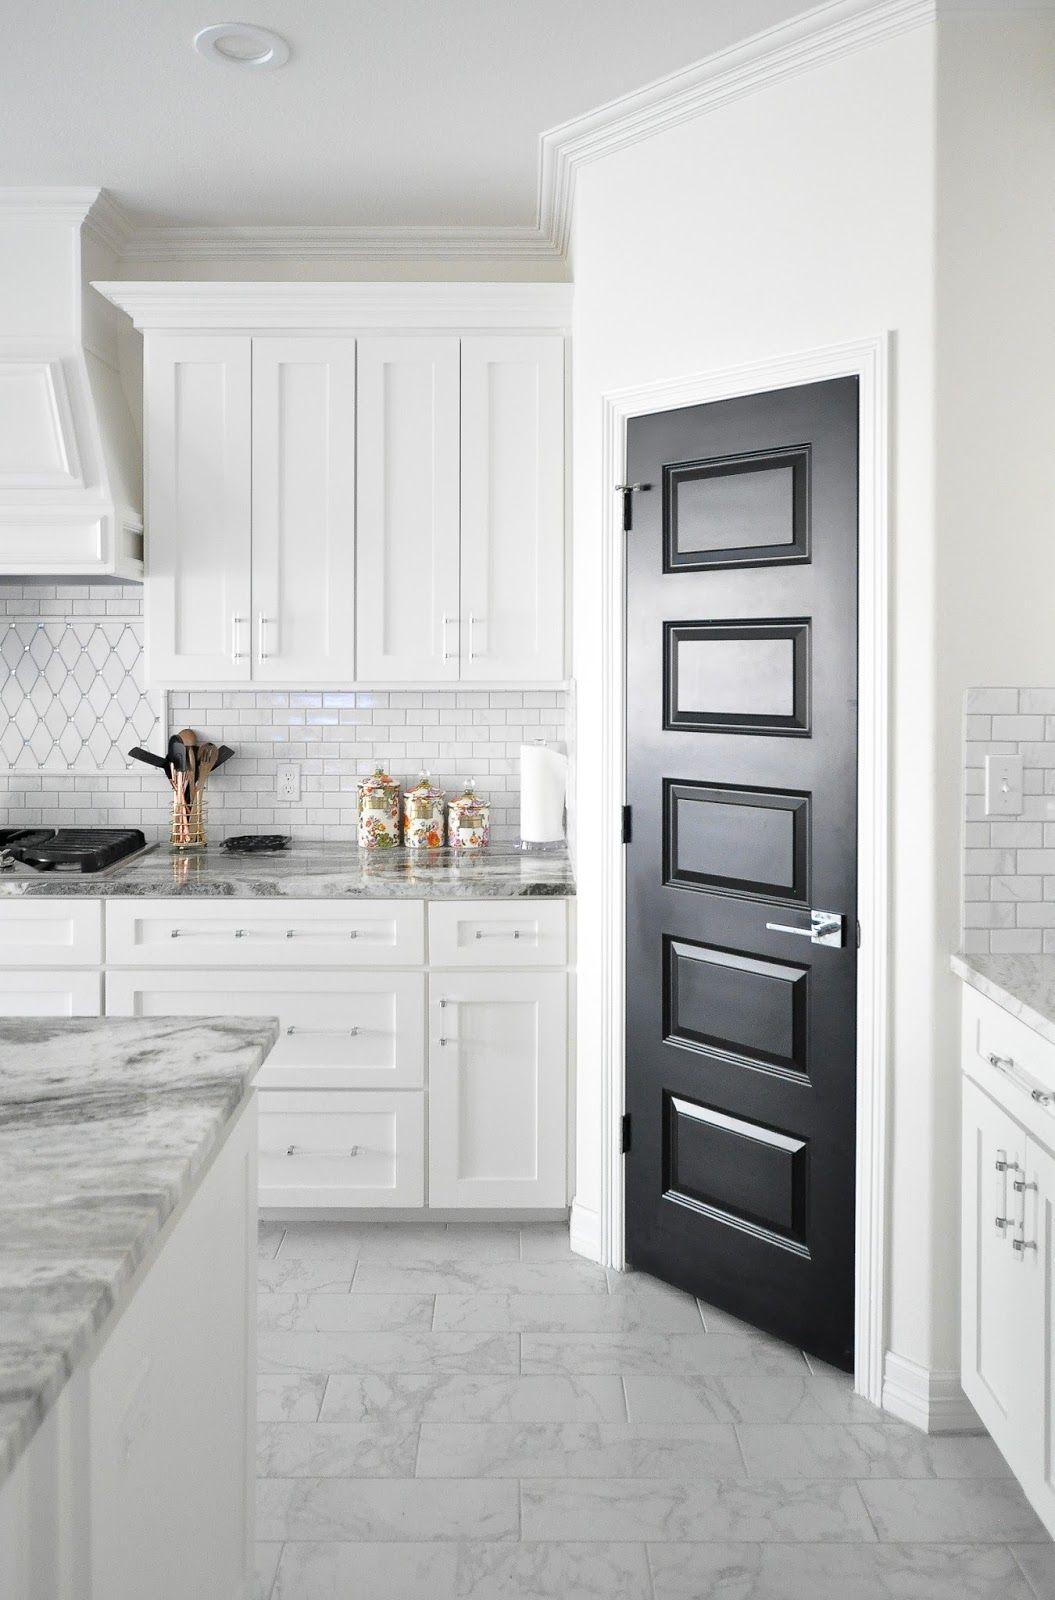 Domino Feature Diversity In Design White Shaker Kitchen